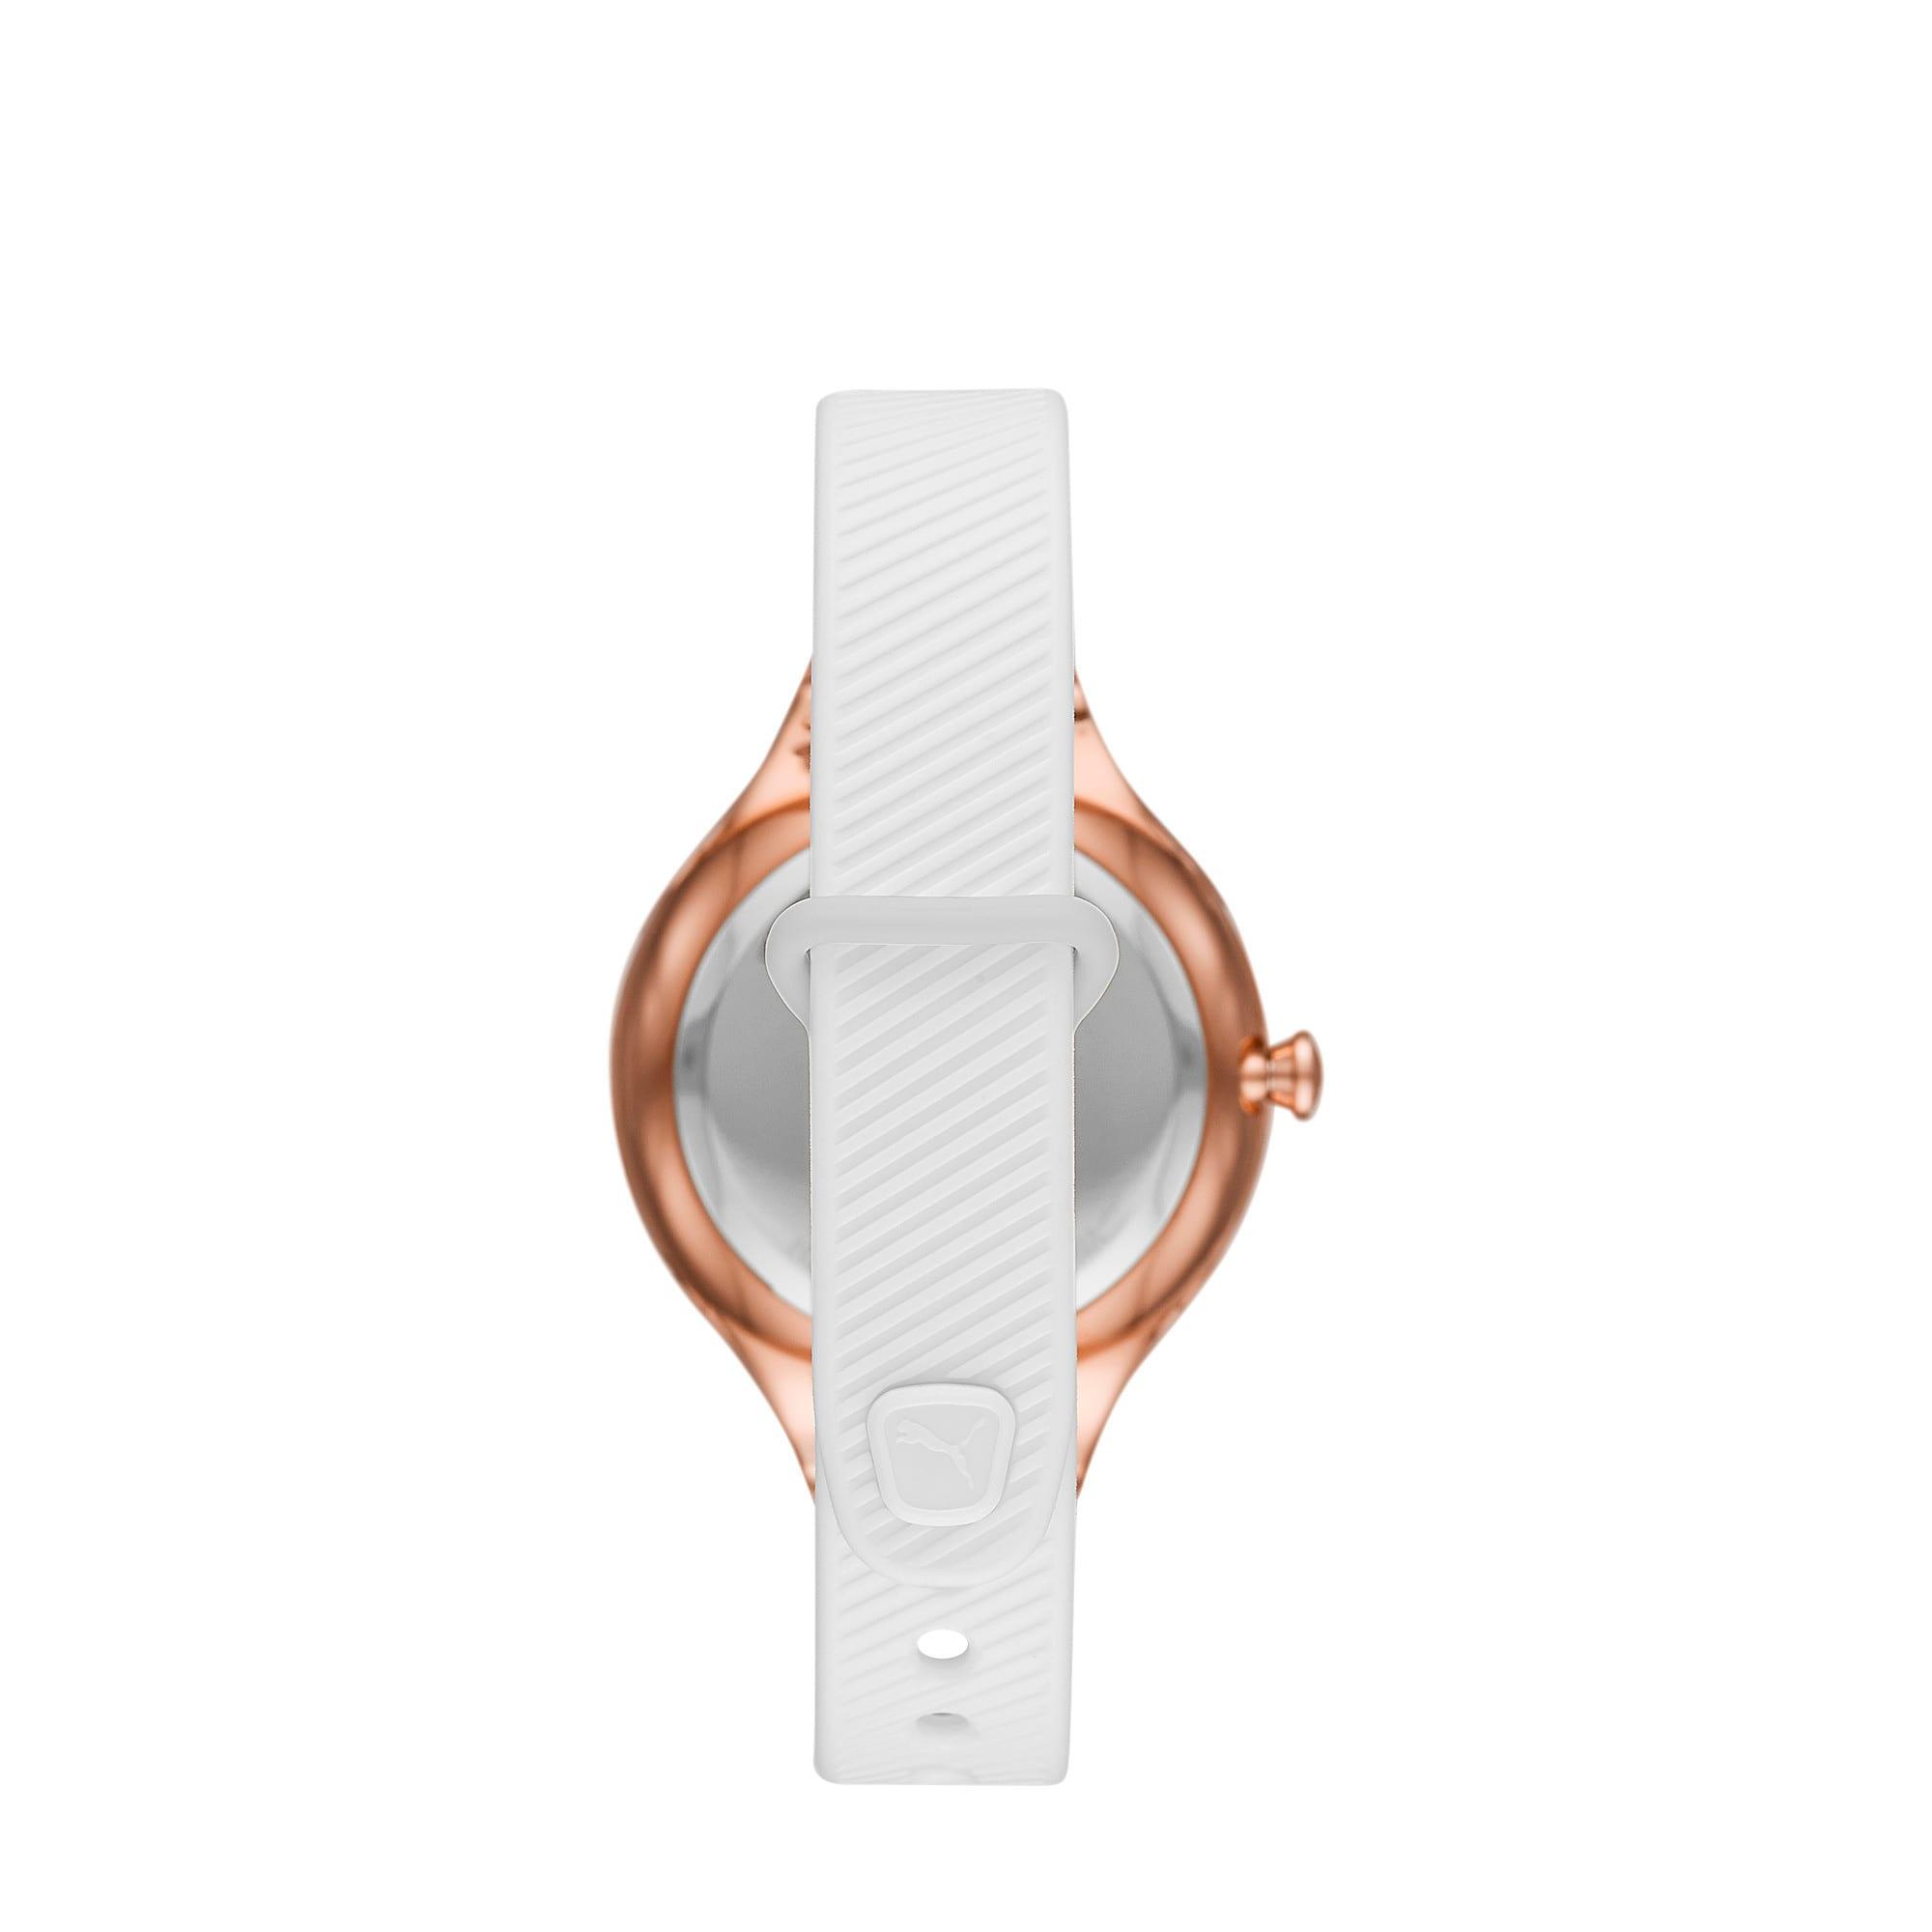 Thumbnail 2 of CONTOUR Ultra-Slim Damen Uhr, Rose gold/White, medium